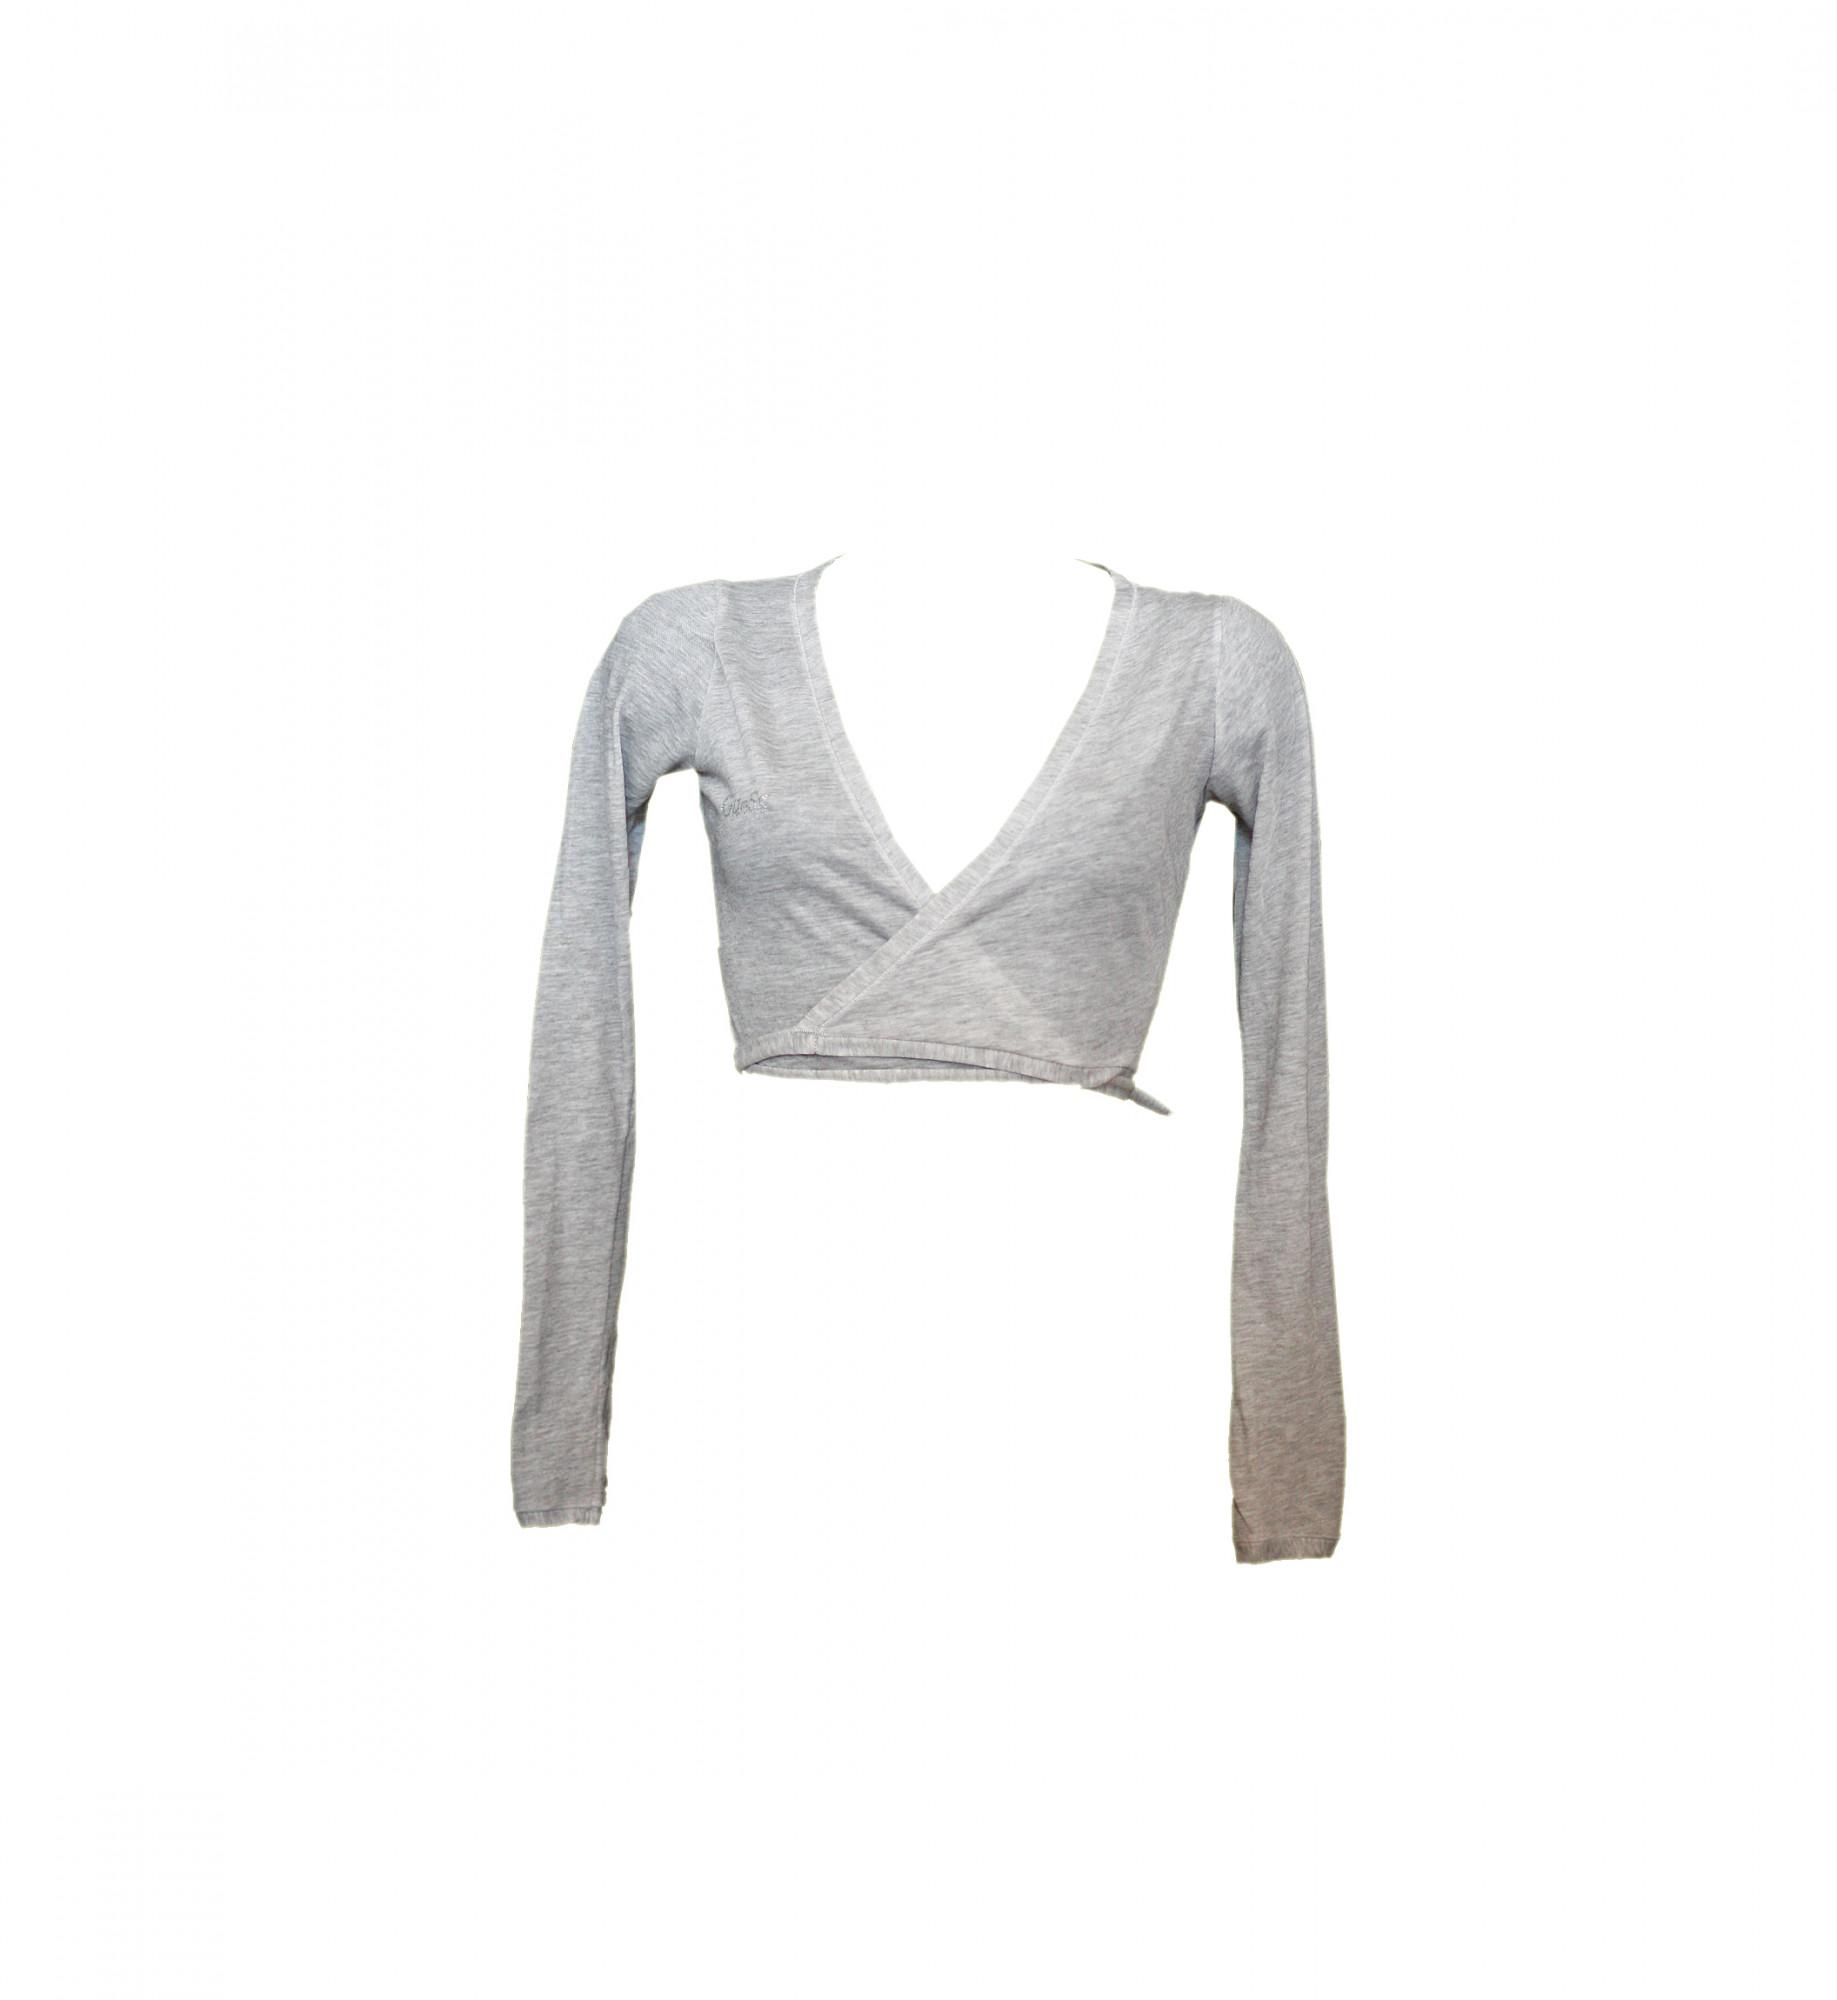 Dámské triko UC6D30 - Guess Barva: šedá, Velikost: M